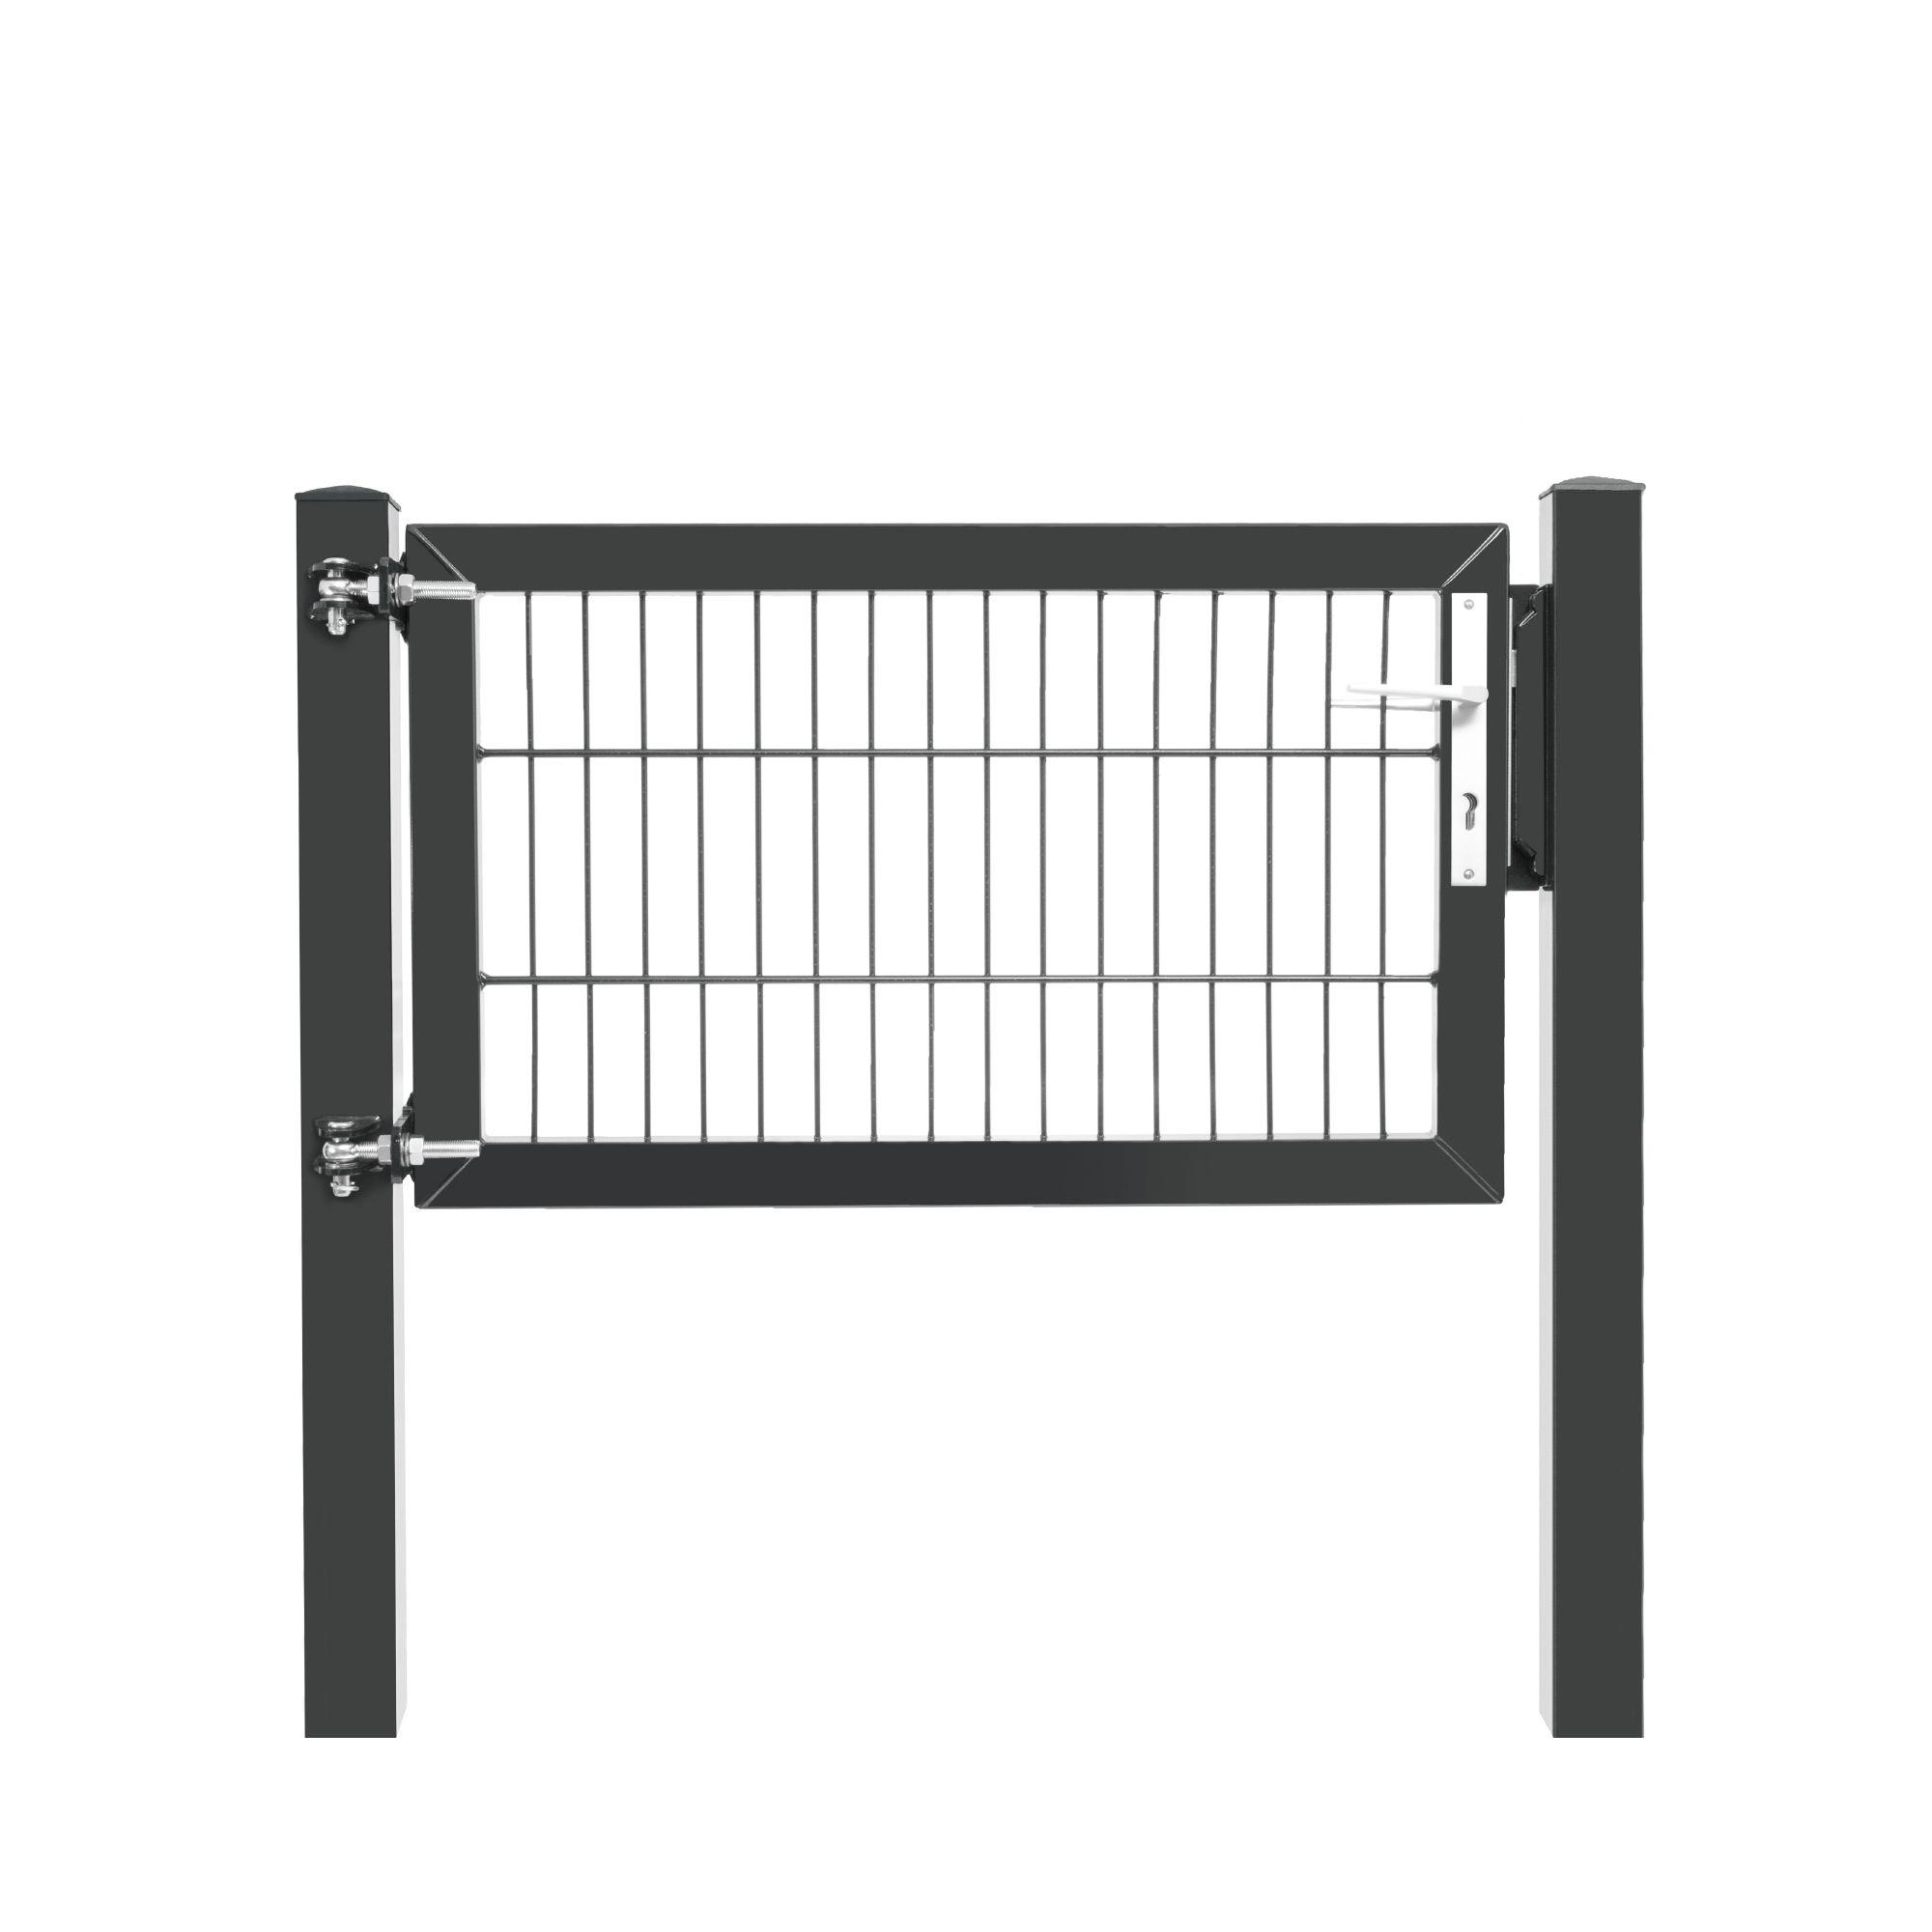 Premium-Pforte - 1 Flügel - 0630 X 1000mm ANTHRAZIT